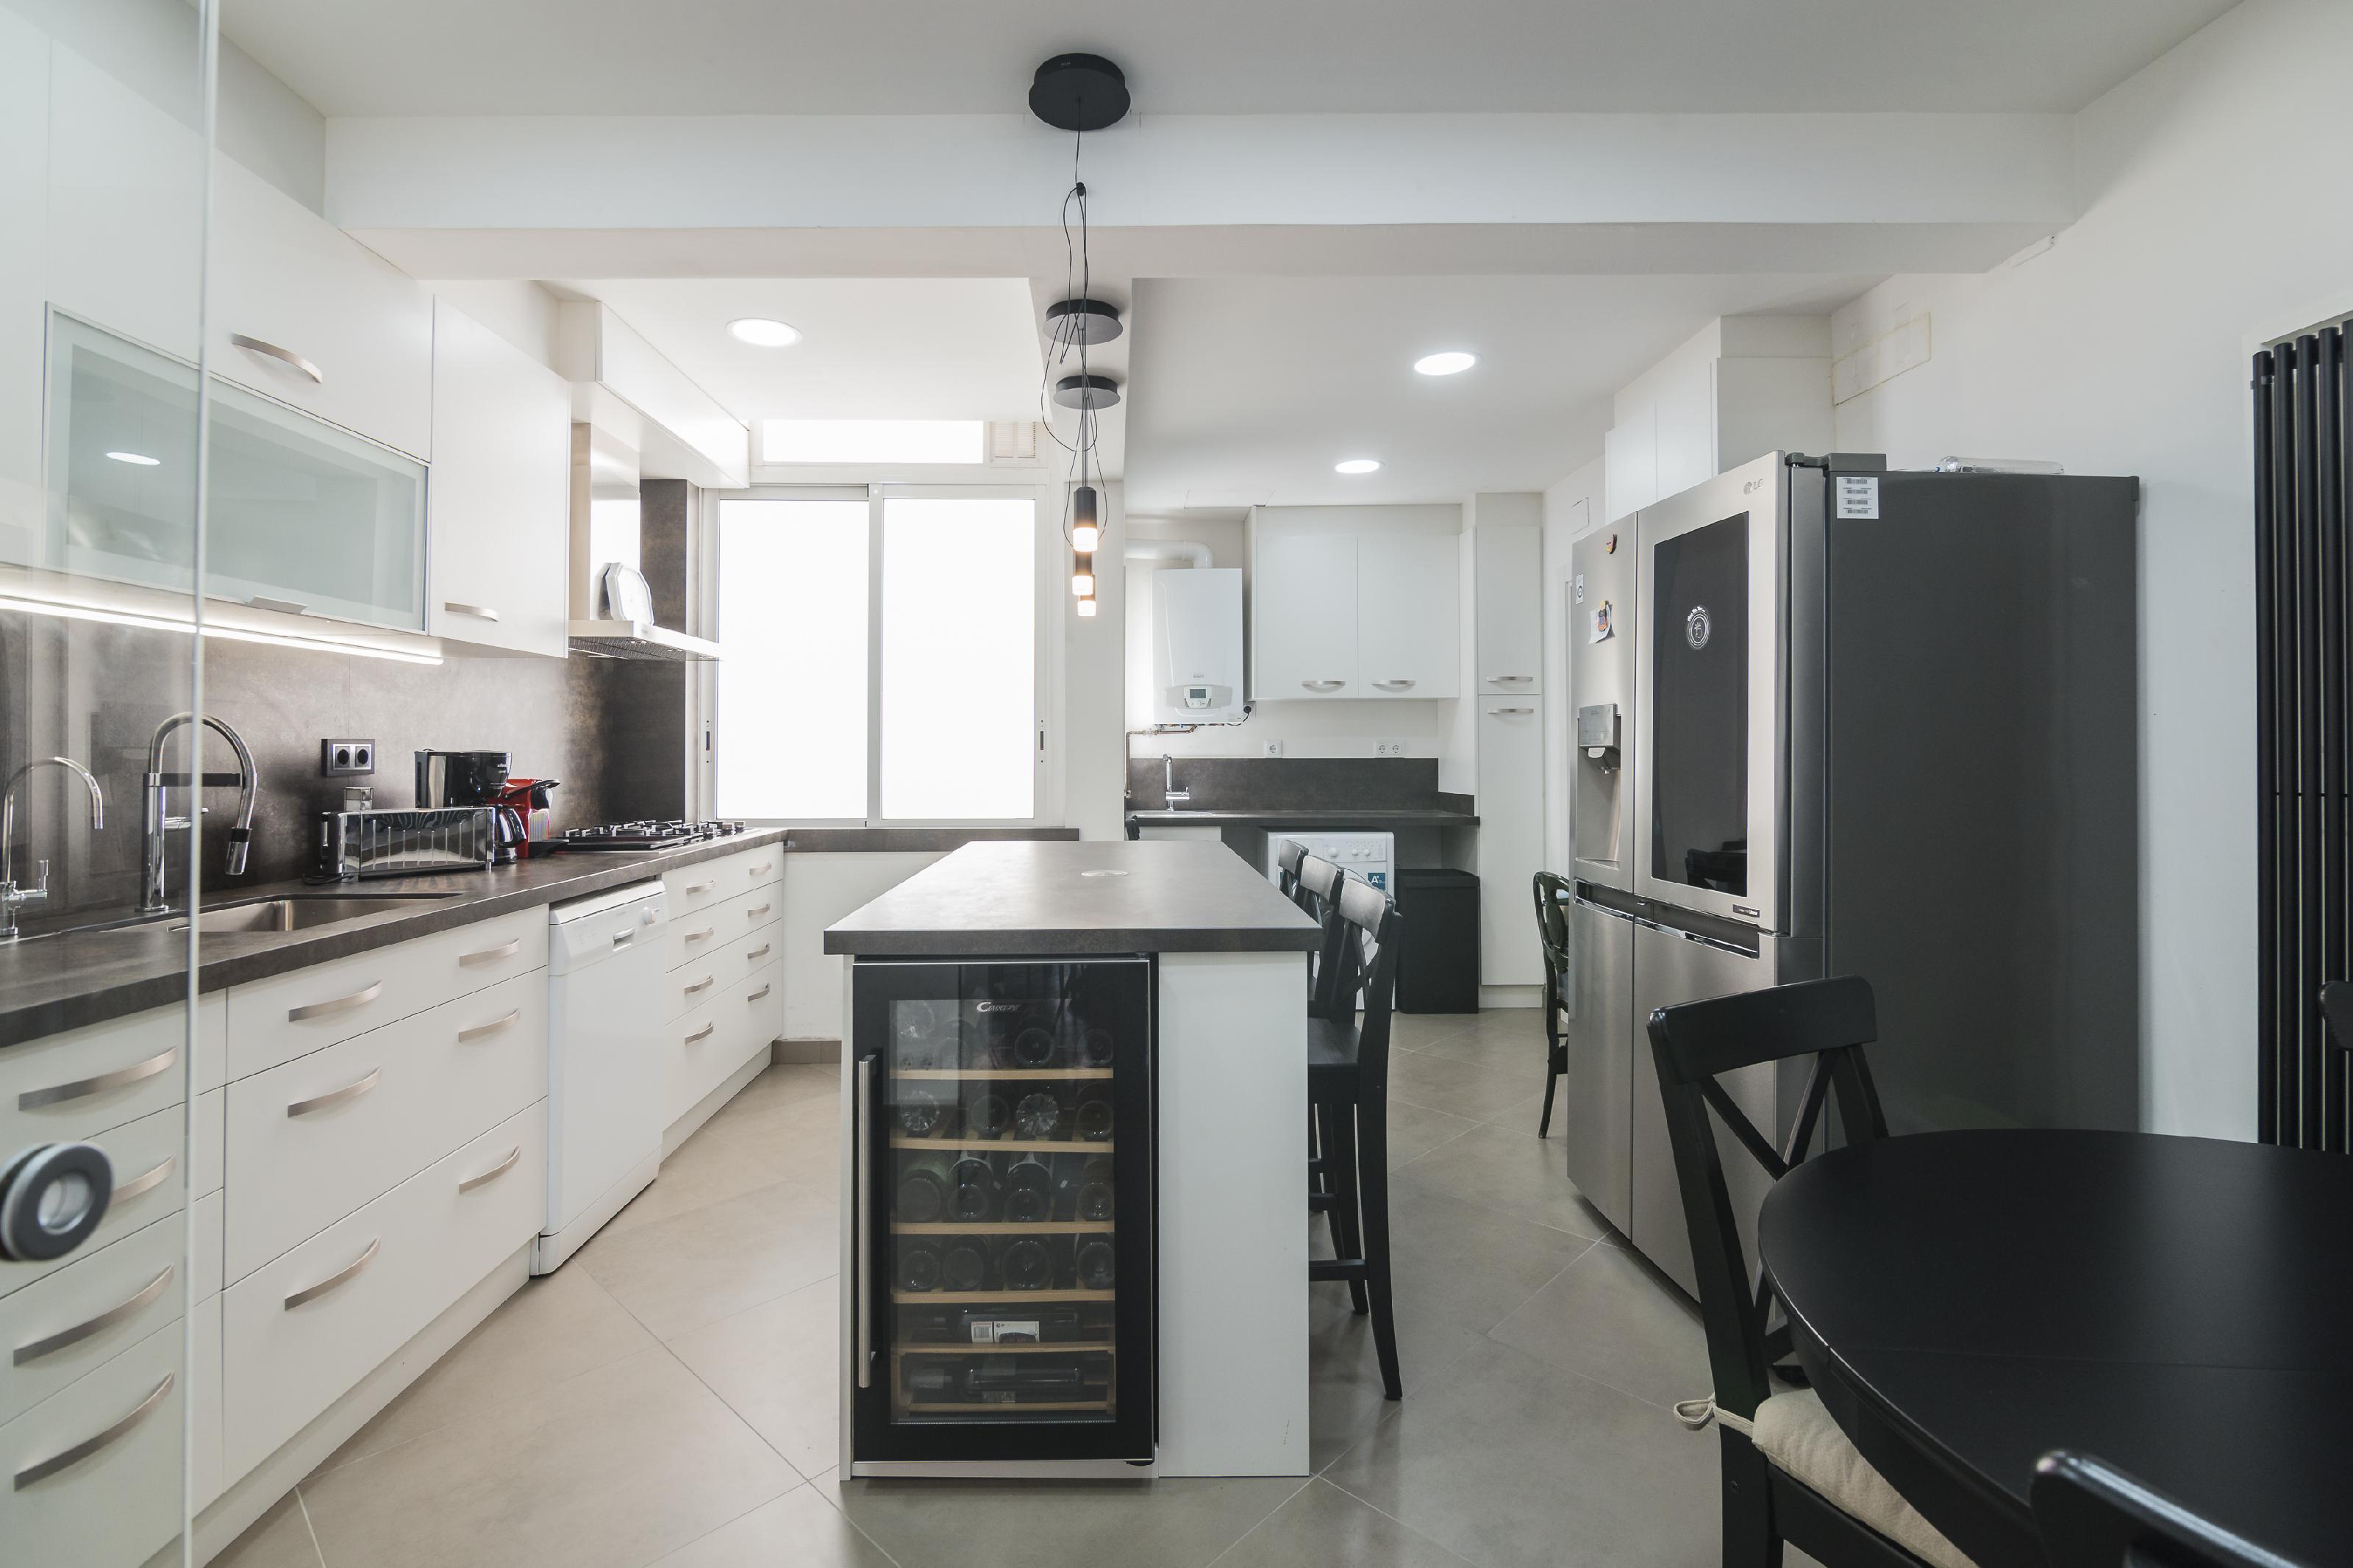 249856 Flat for sale in Sarrià-Sant Gervasi, Sant Gervasi-Galvany 18